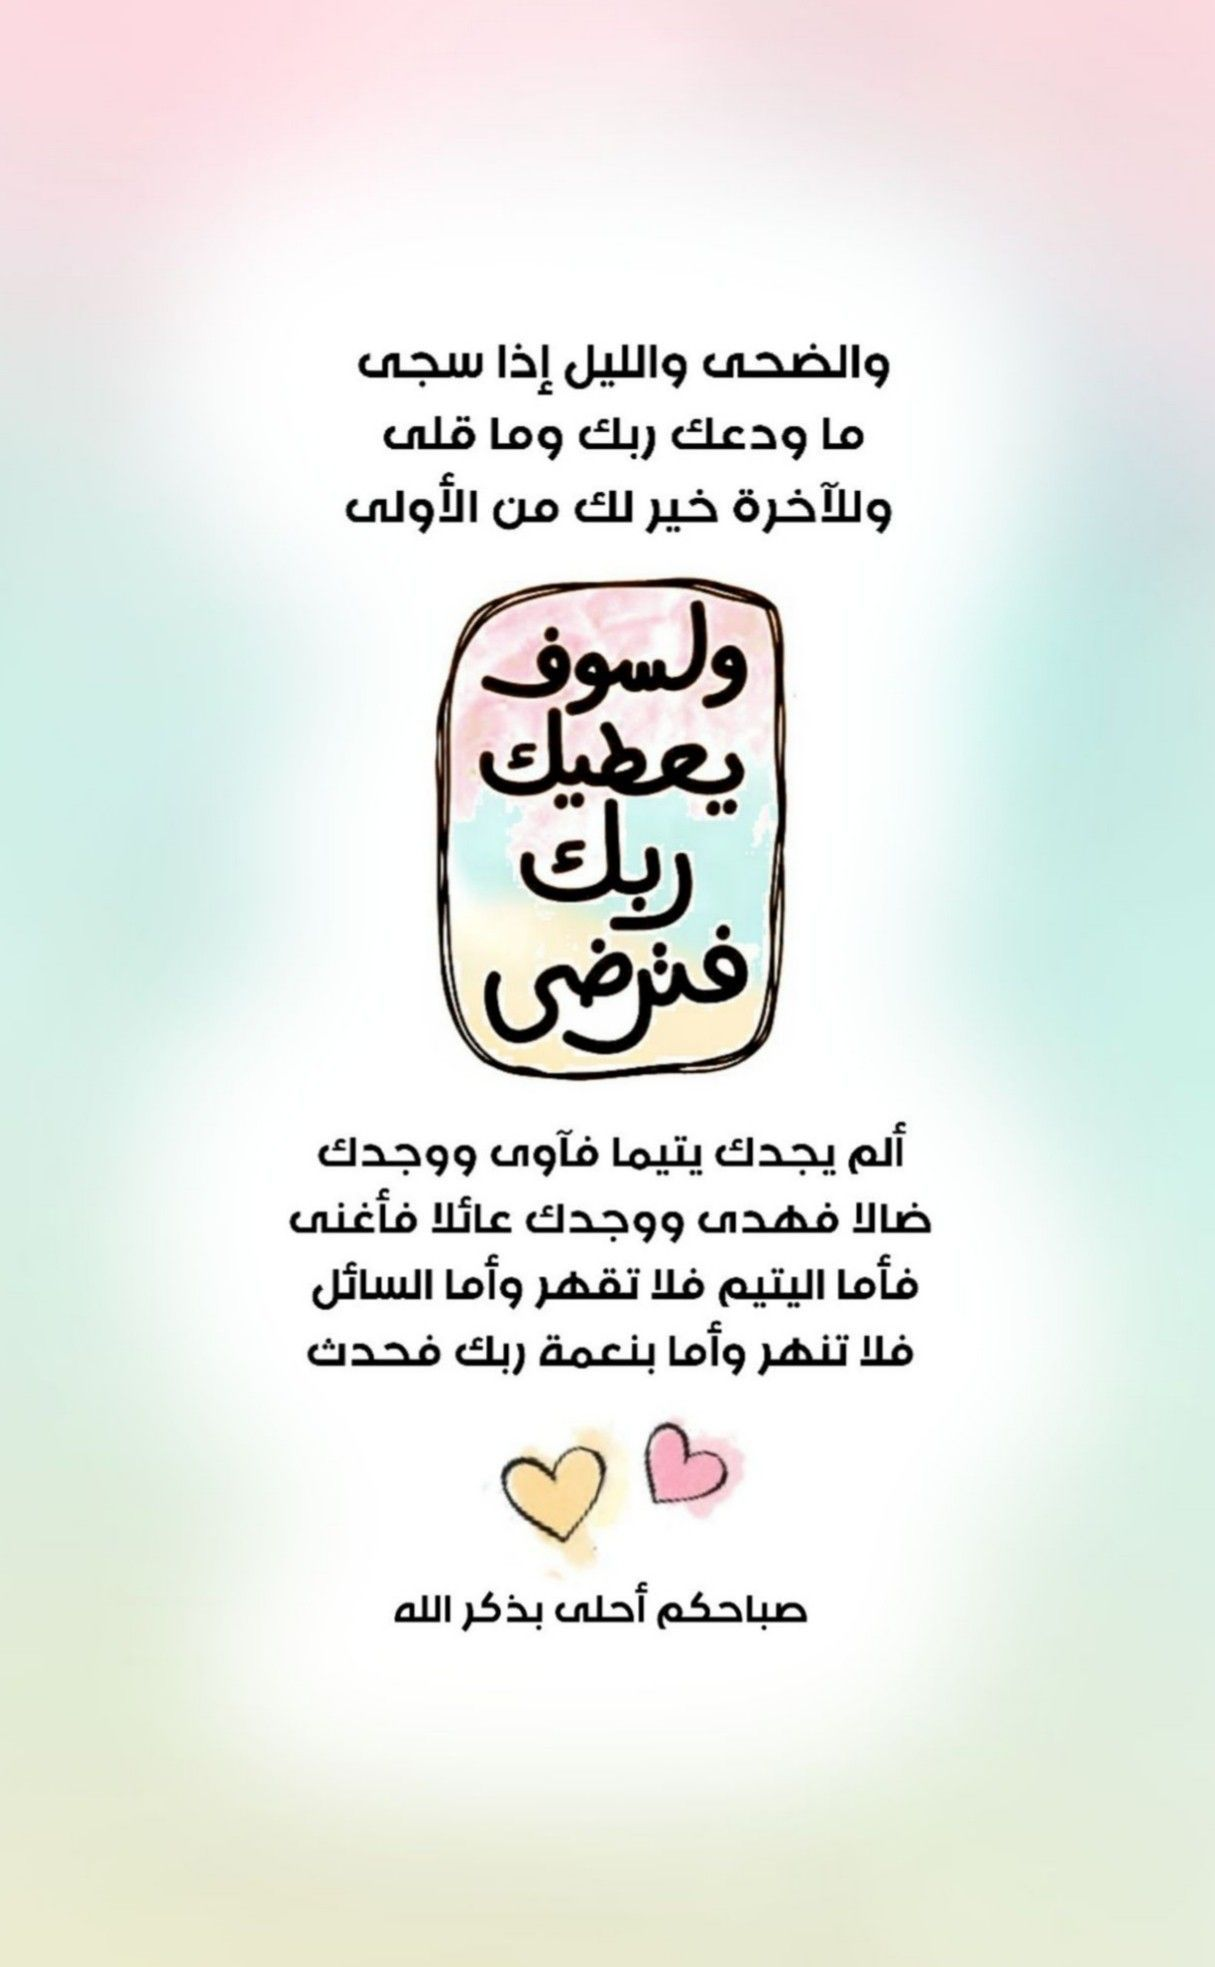 Pin By صورة و كلمة On صباح الخير Good Morning Photo Quotes Quran Quotes Quotes